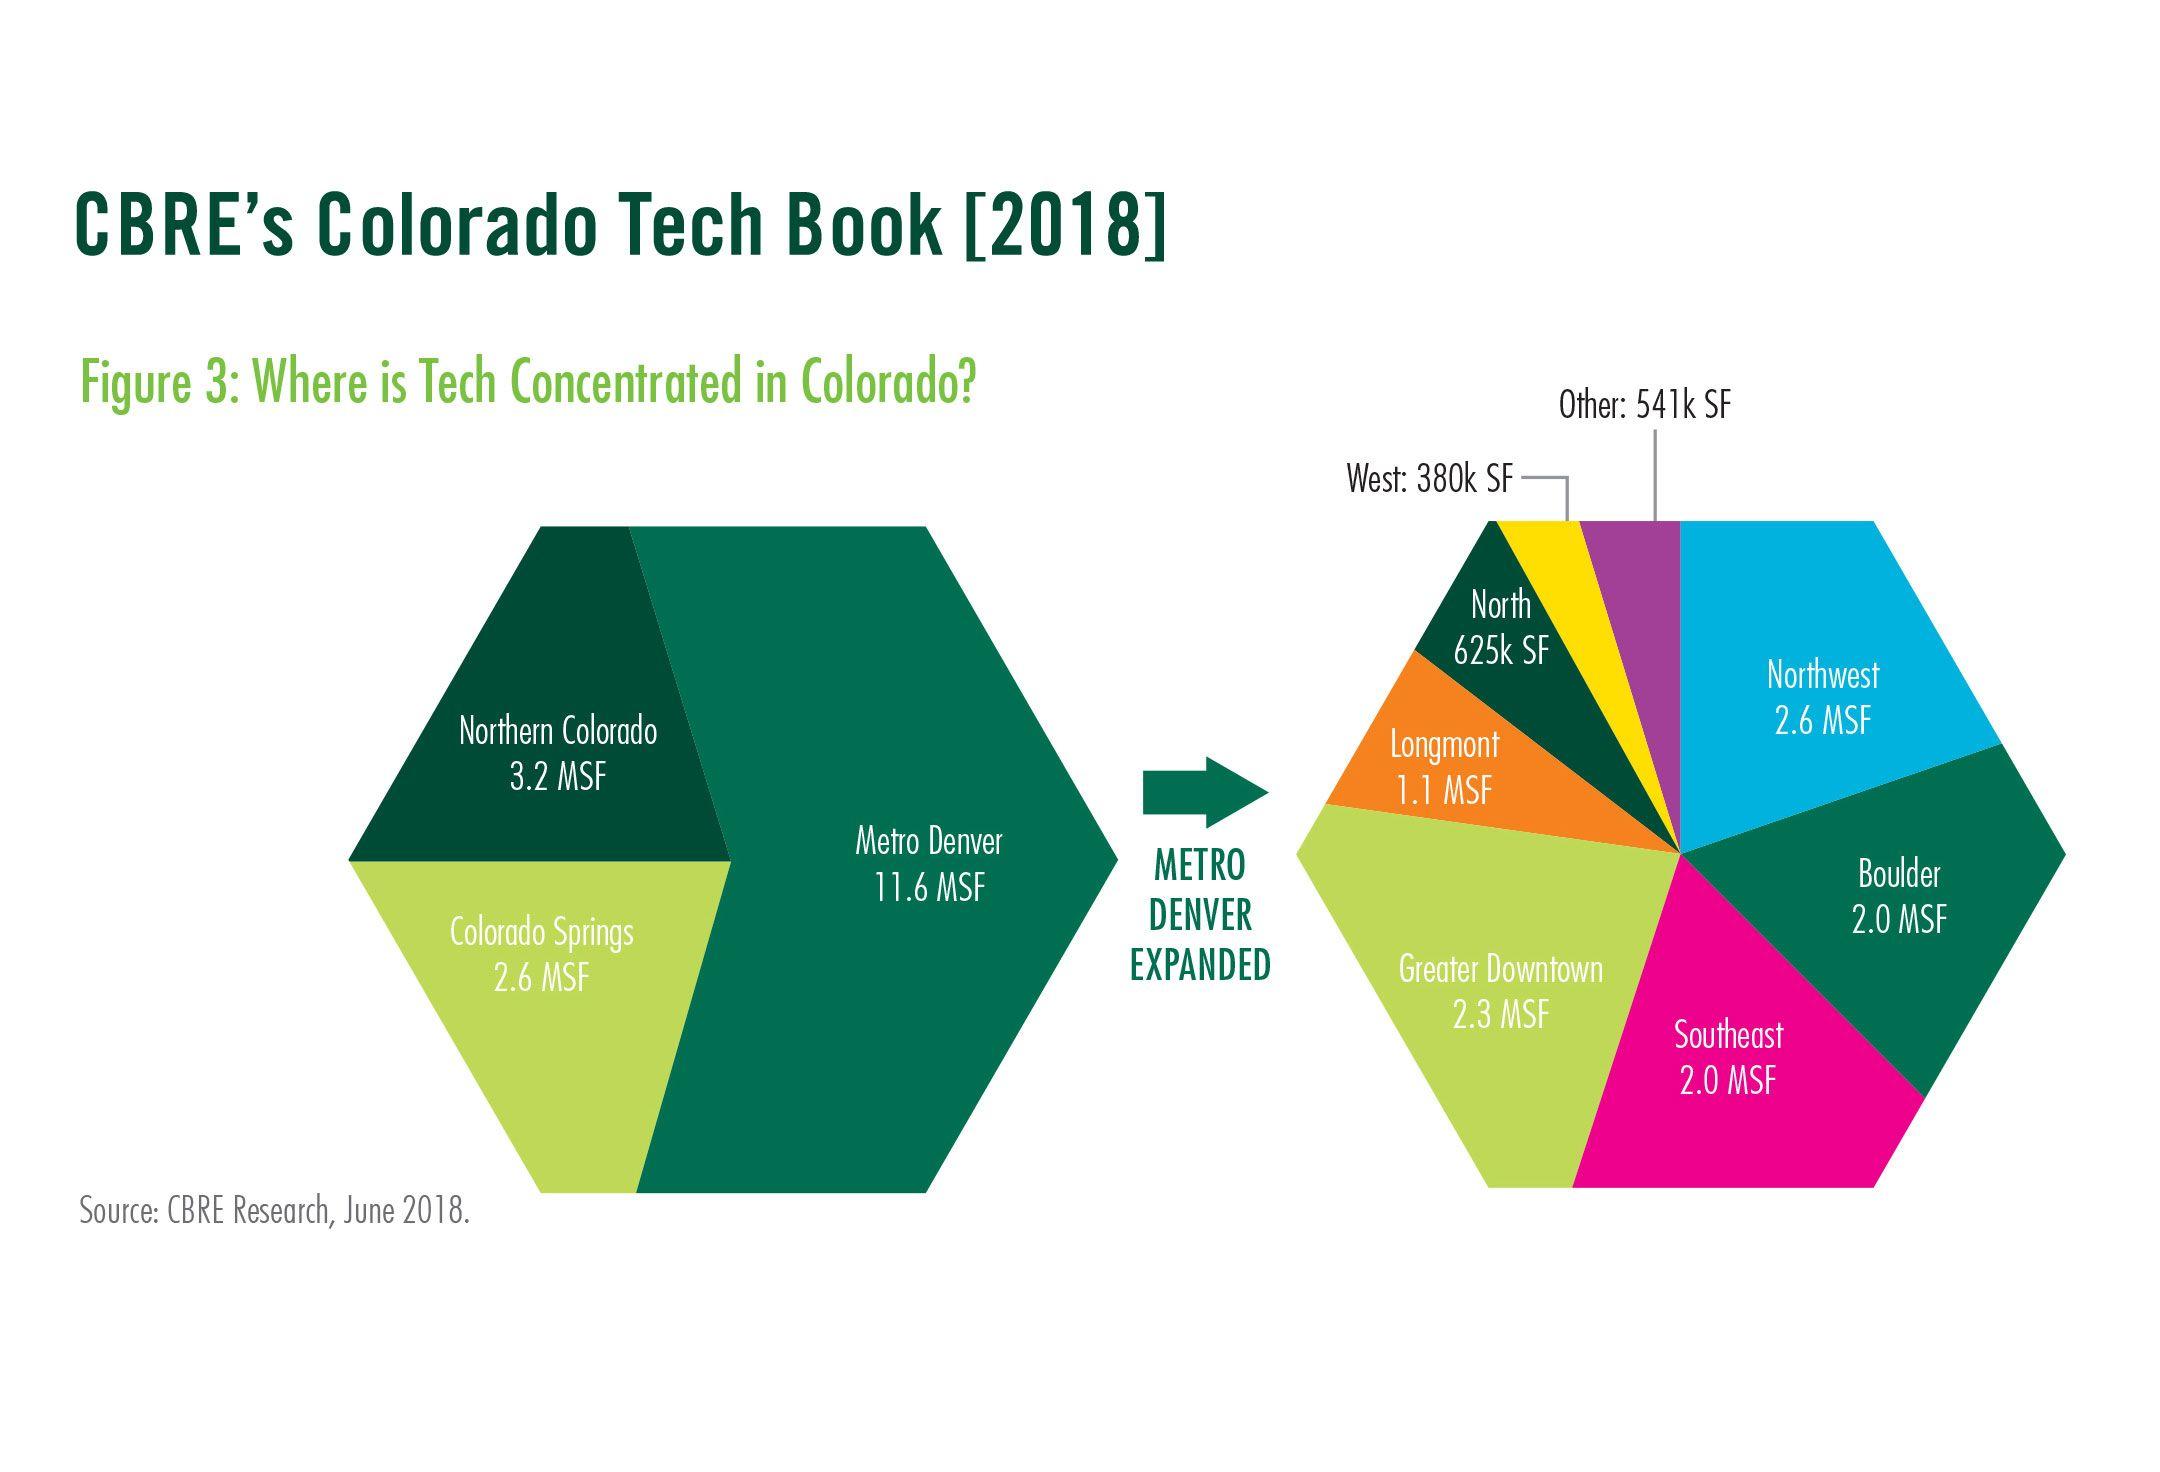 CBRE Colorado Tech Concentration